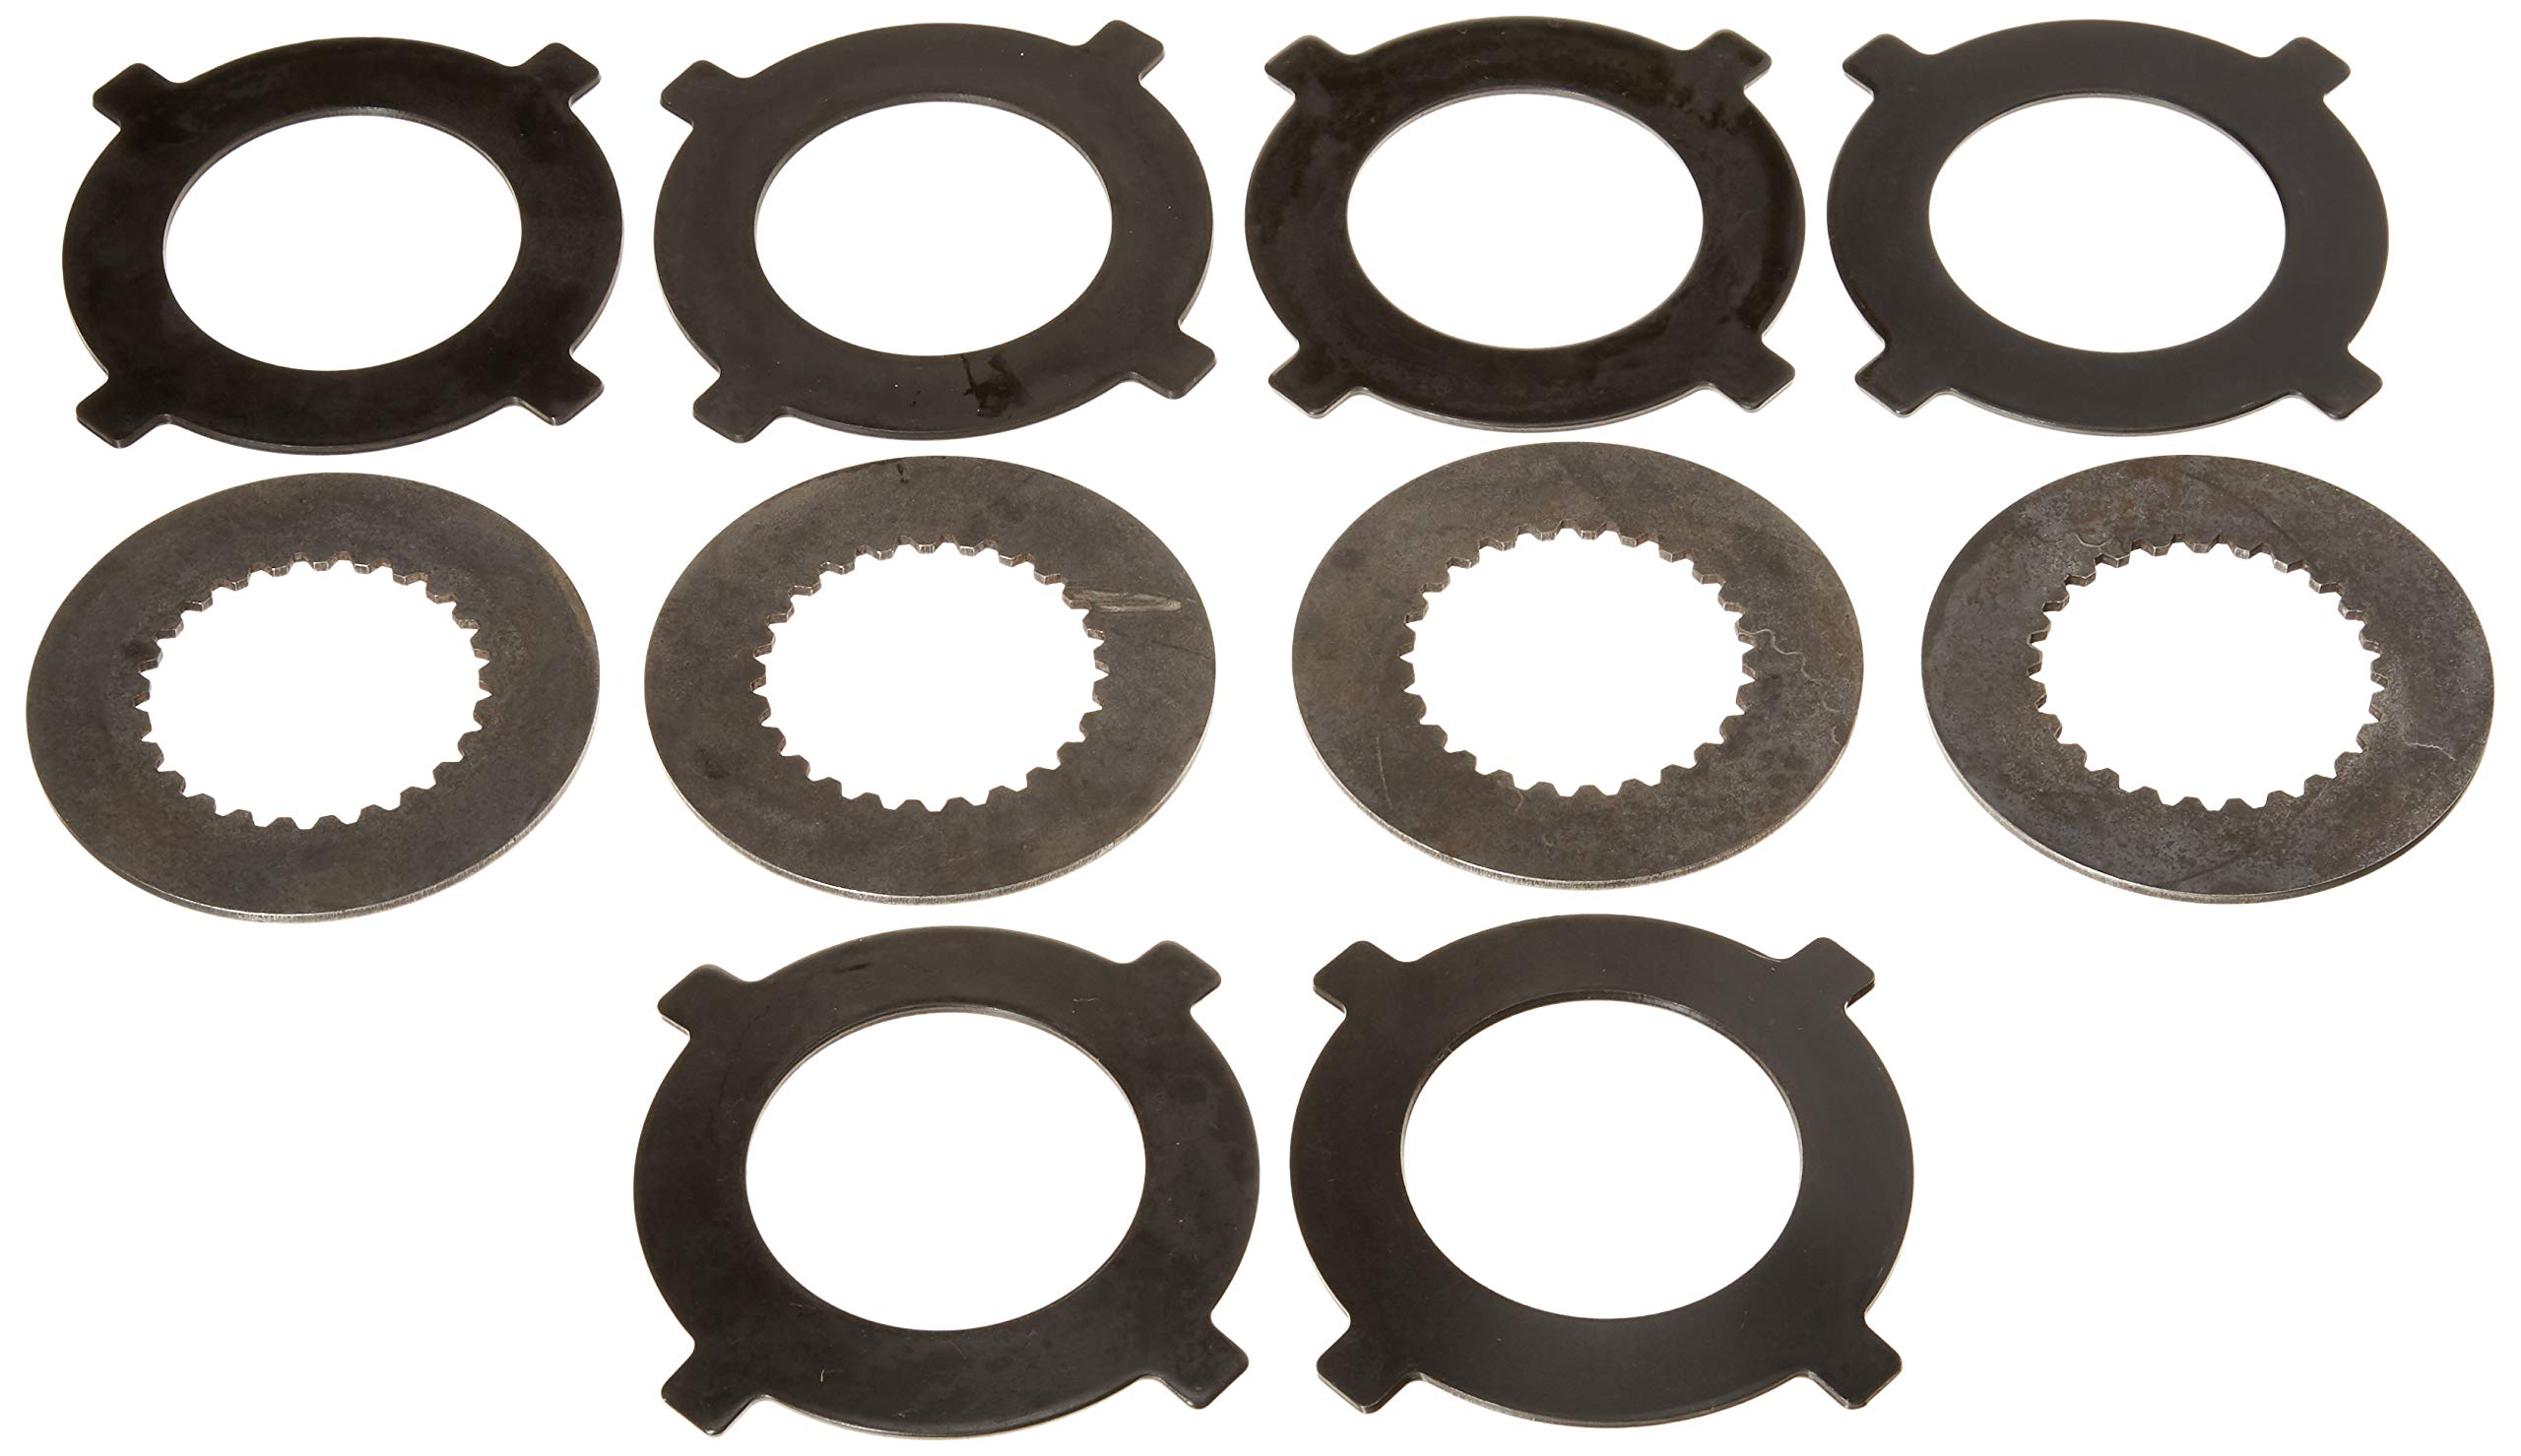 Spicer 22233X Clutch Plate Kit